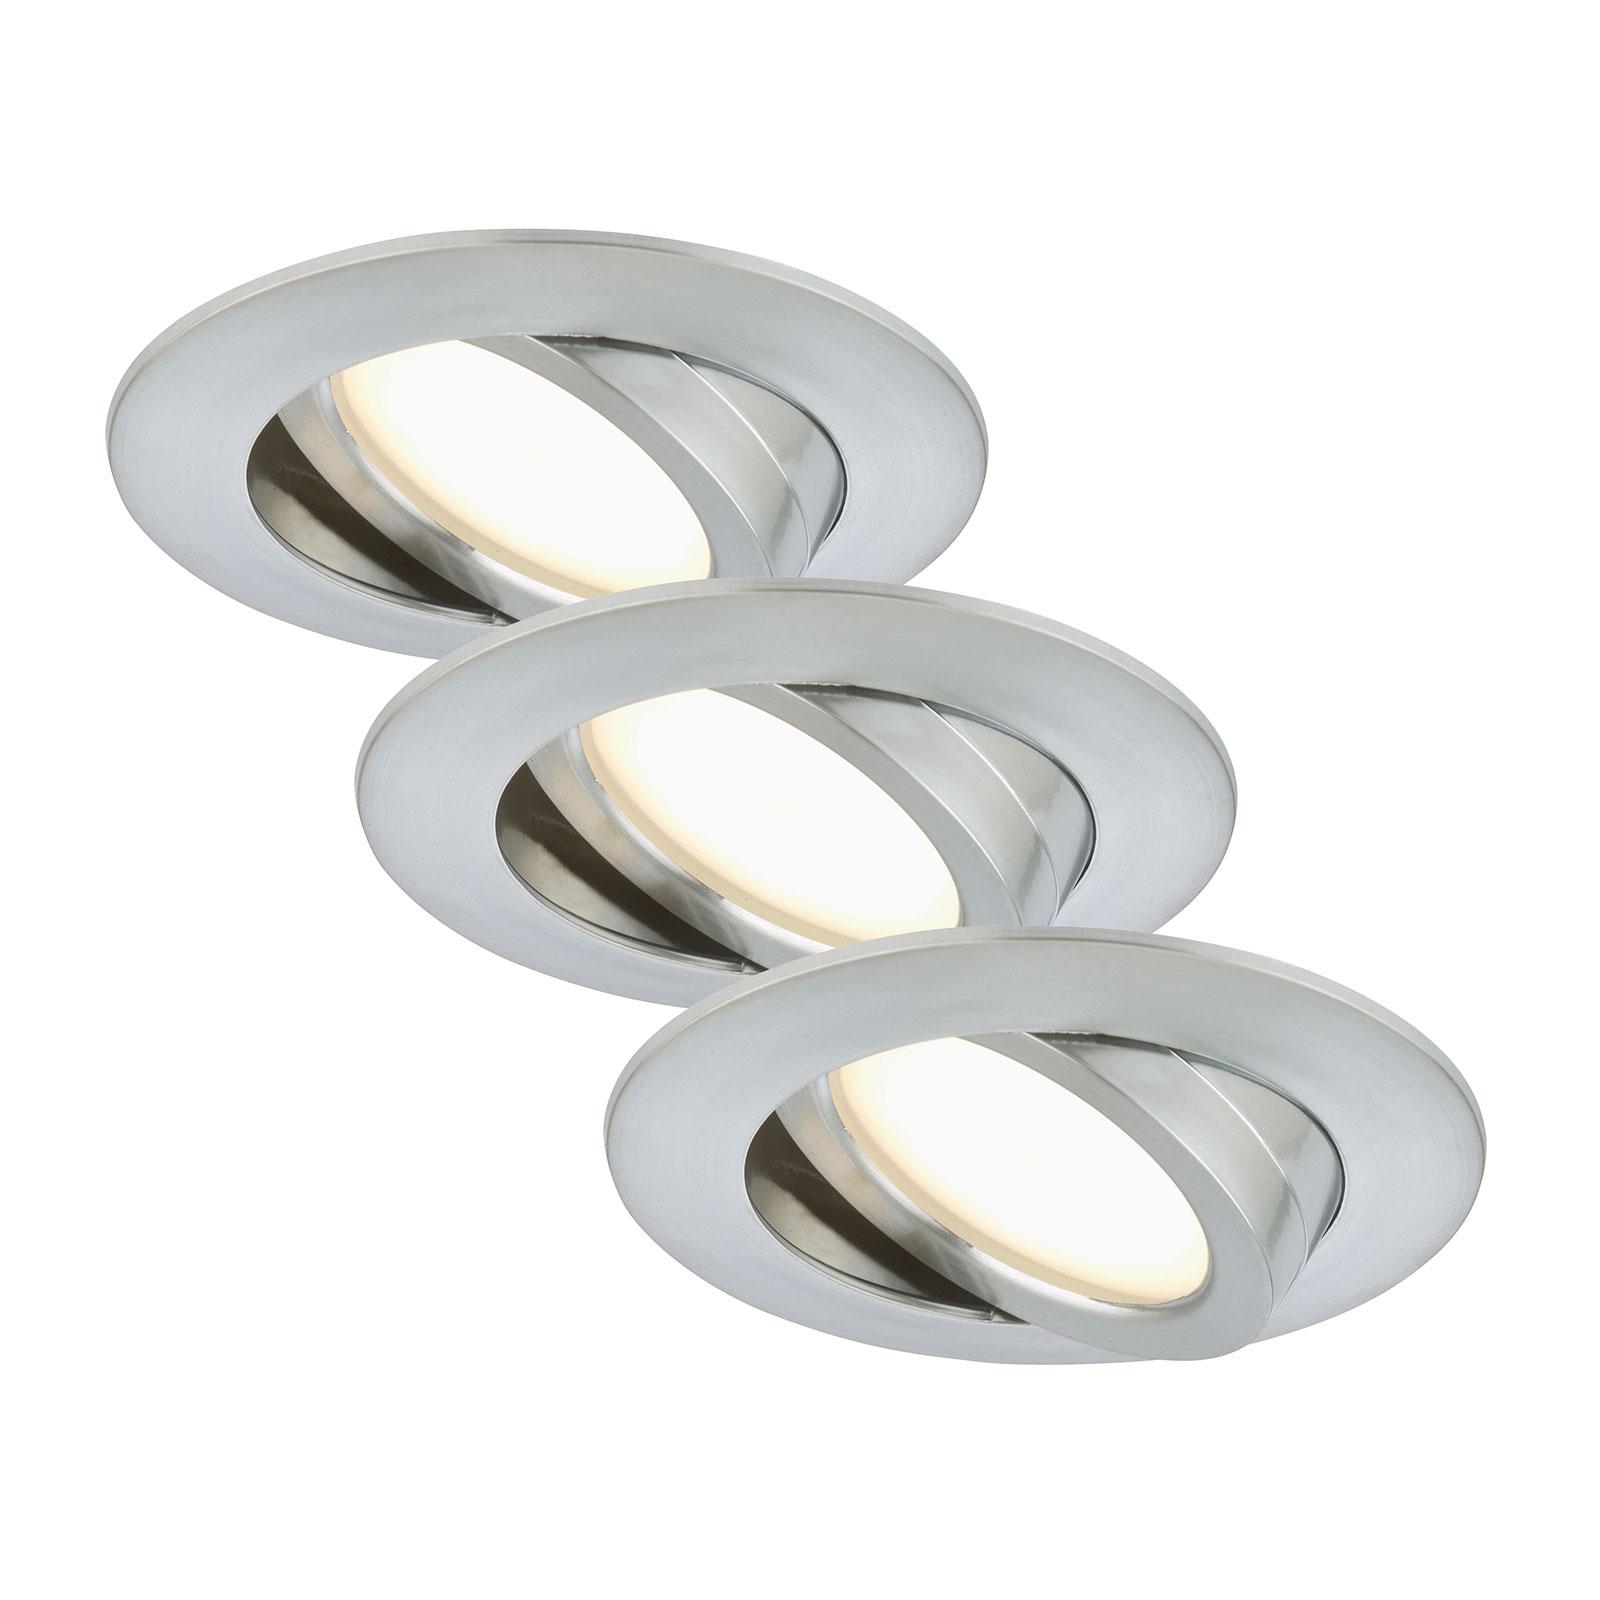 I 3-pack - LED-inbyggnadslampa Bert, lutbar